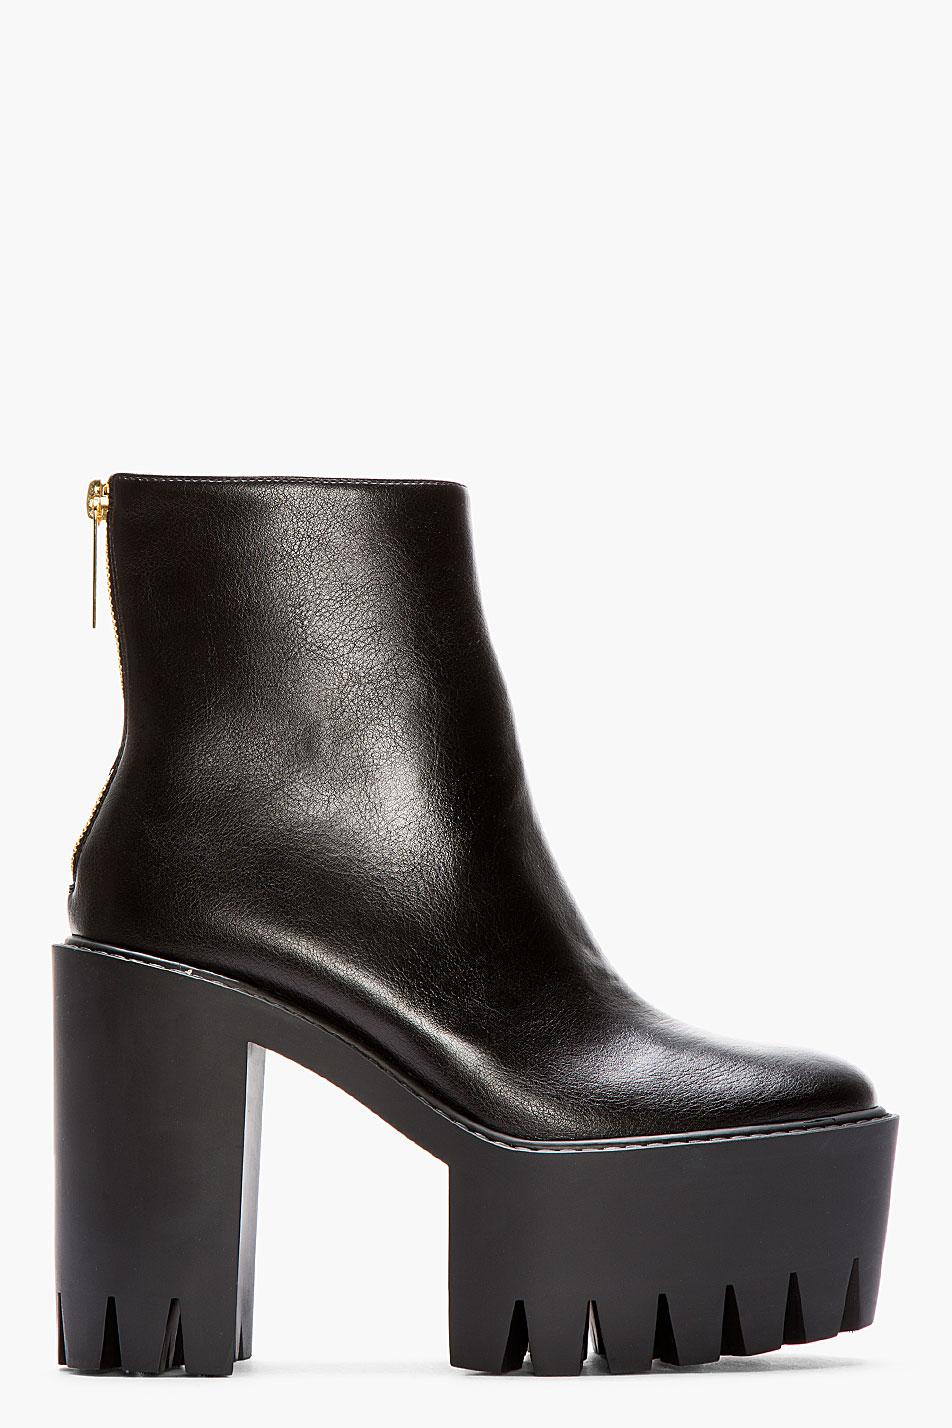 Stella mc cartney Leather Ankle Boots Clearance Shop djAdUK